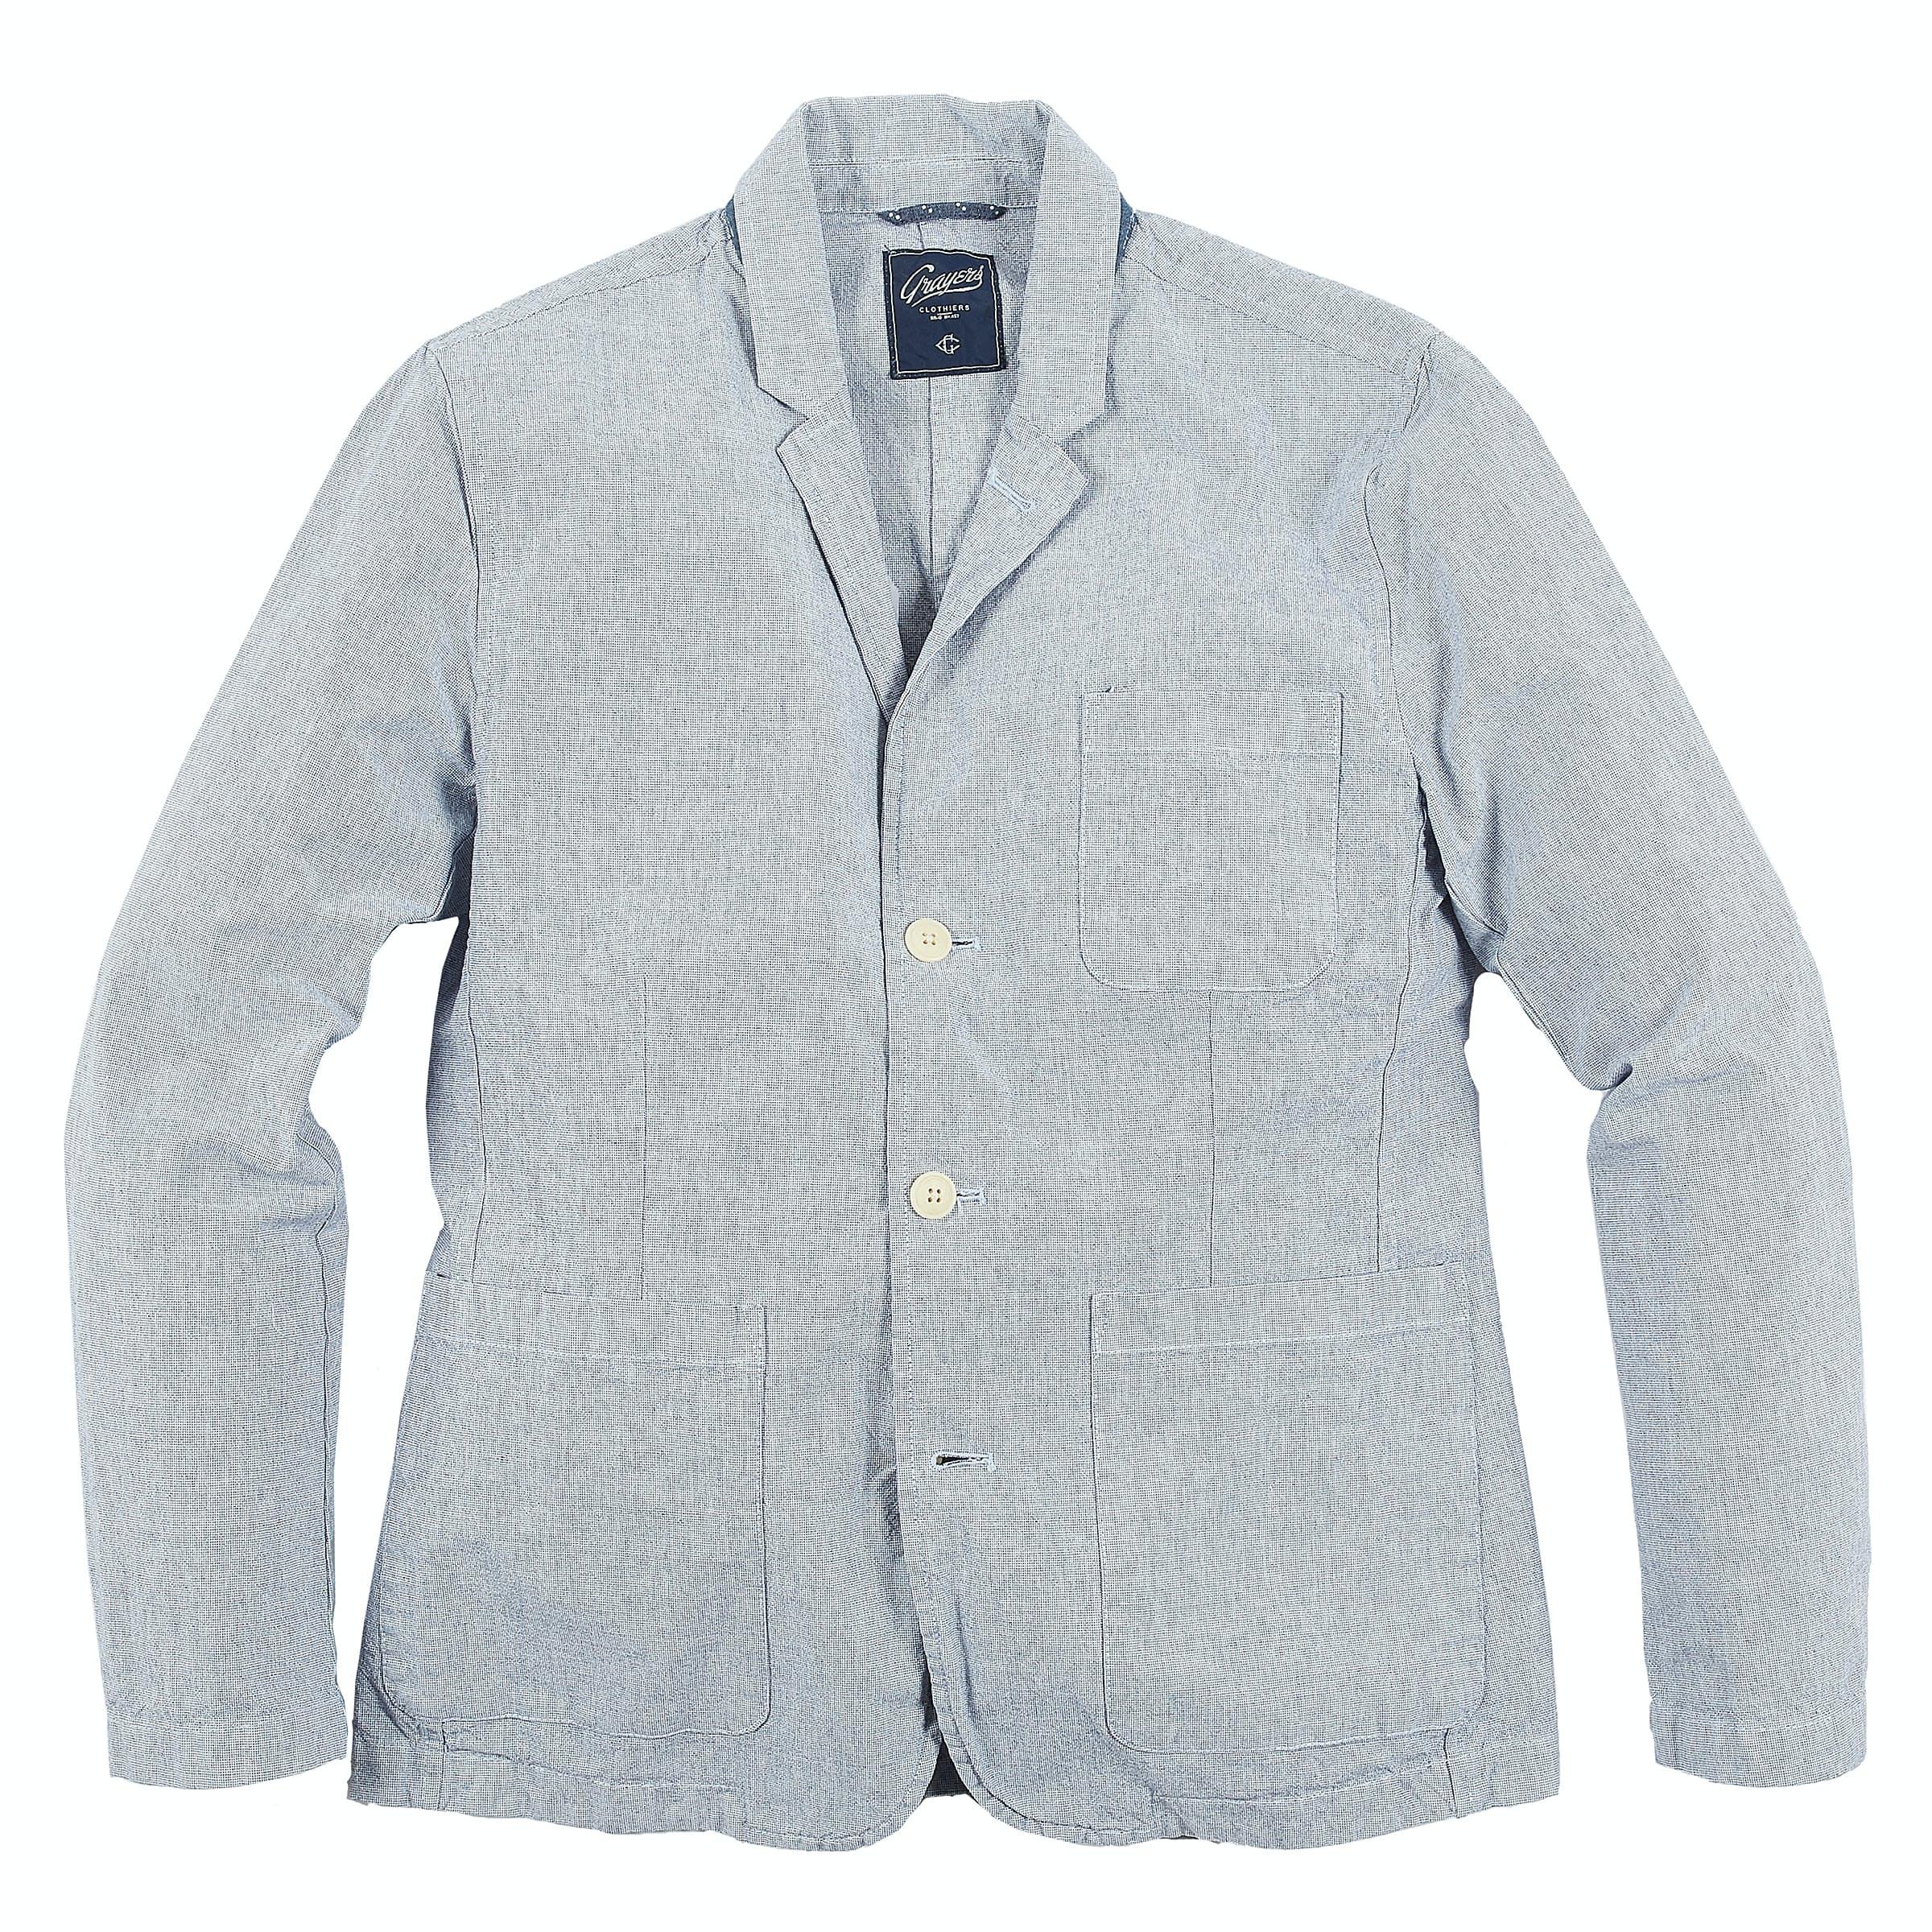 Y7aco8inui grayers eastvale 3 button blazer 0 original